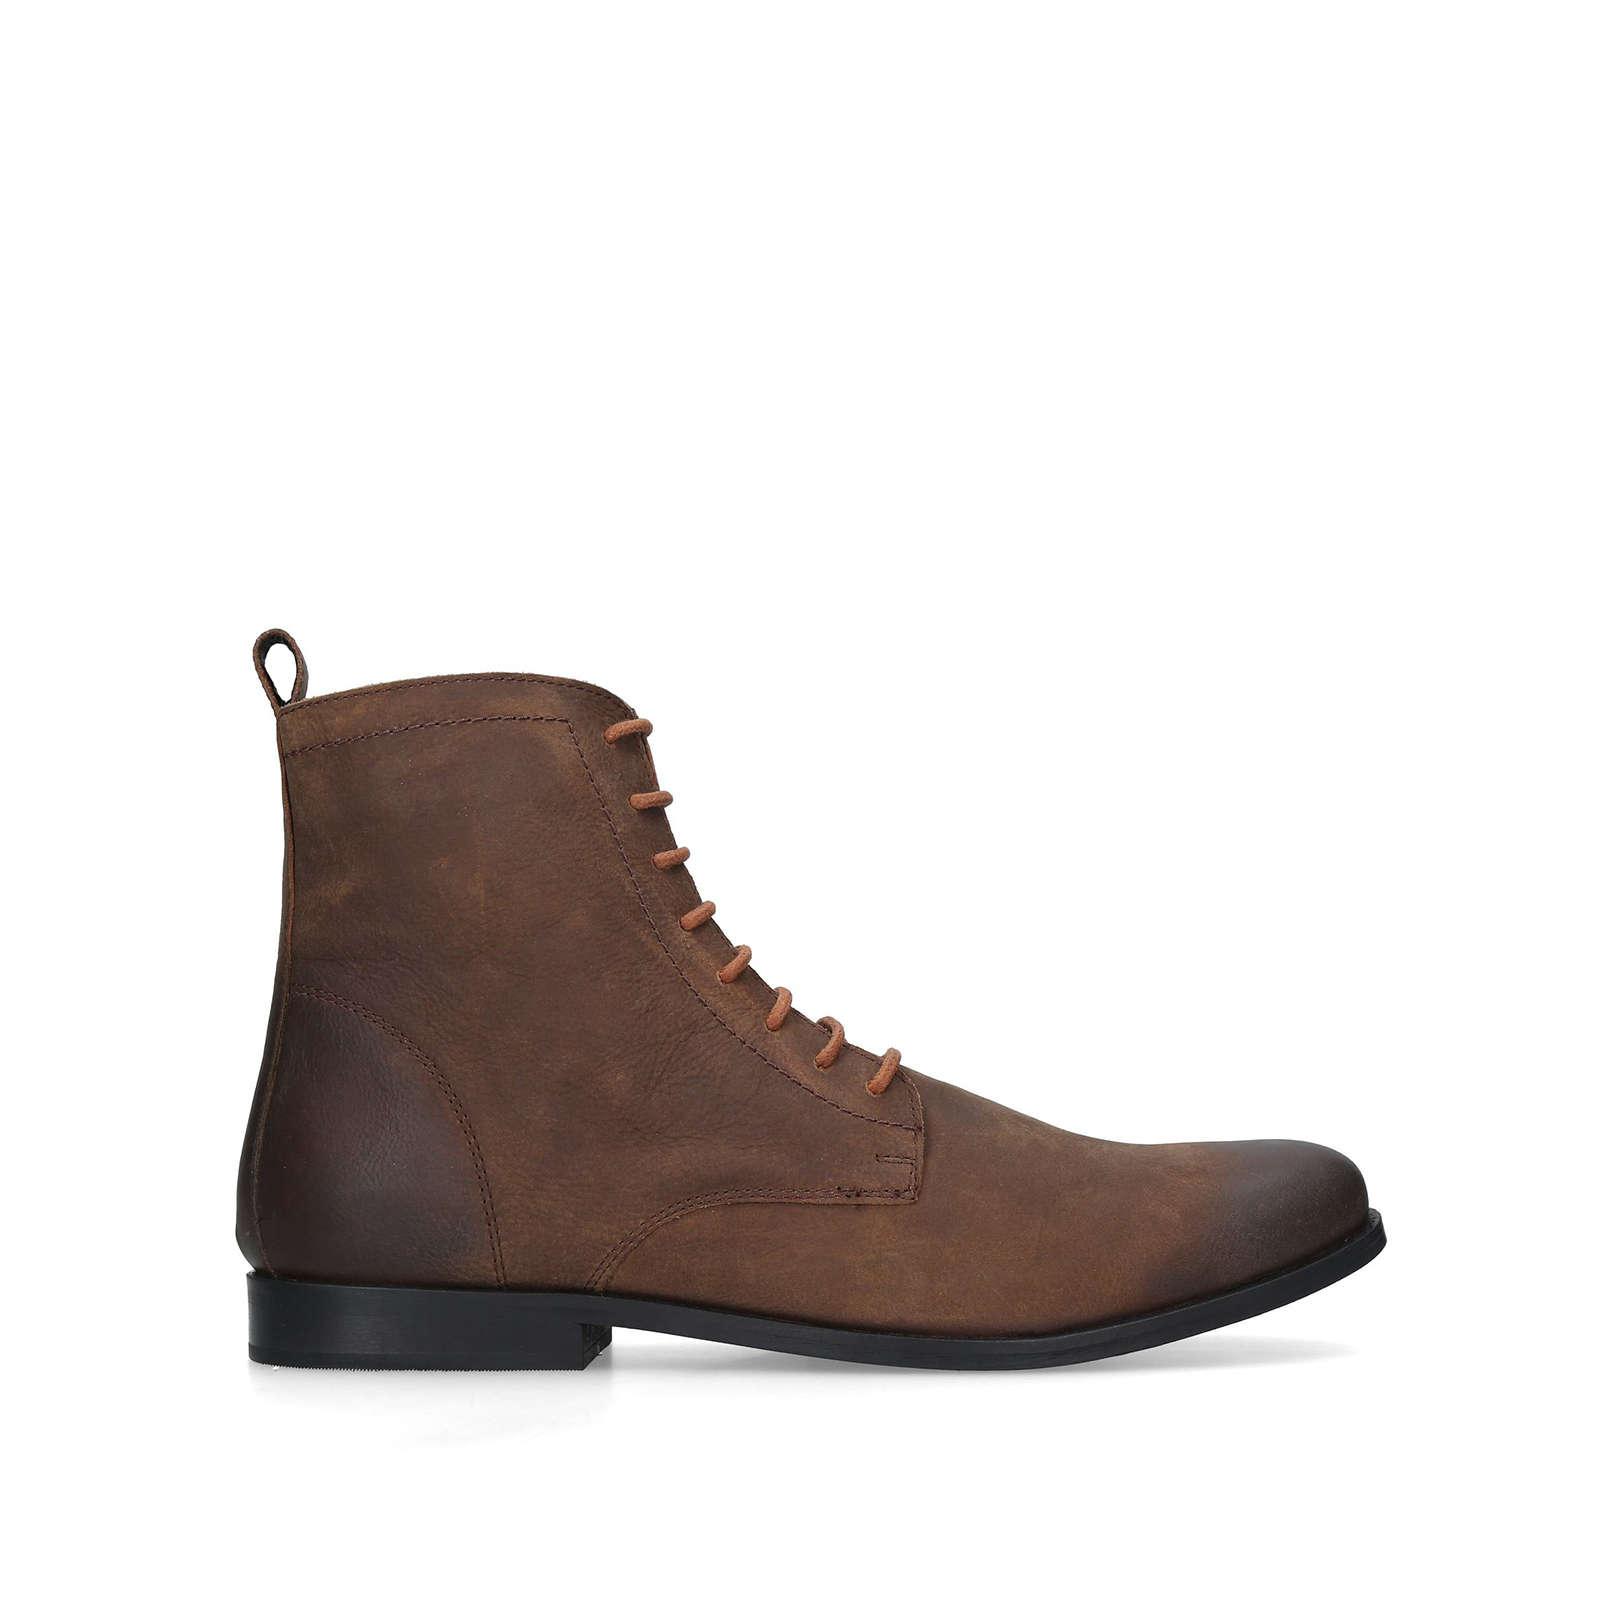 7e159ea2c40 PAISLEY - KG KURT GEIGER Boots